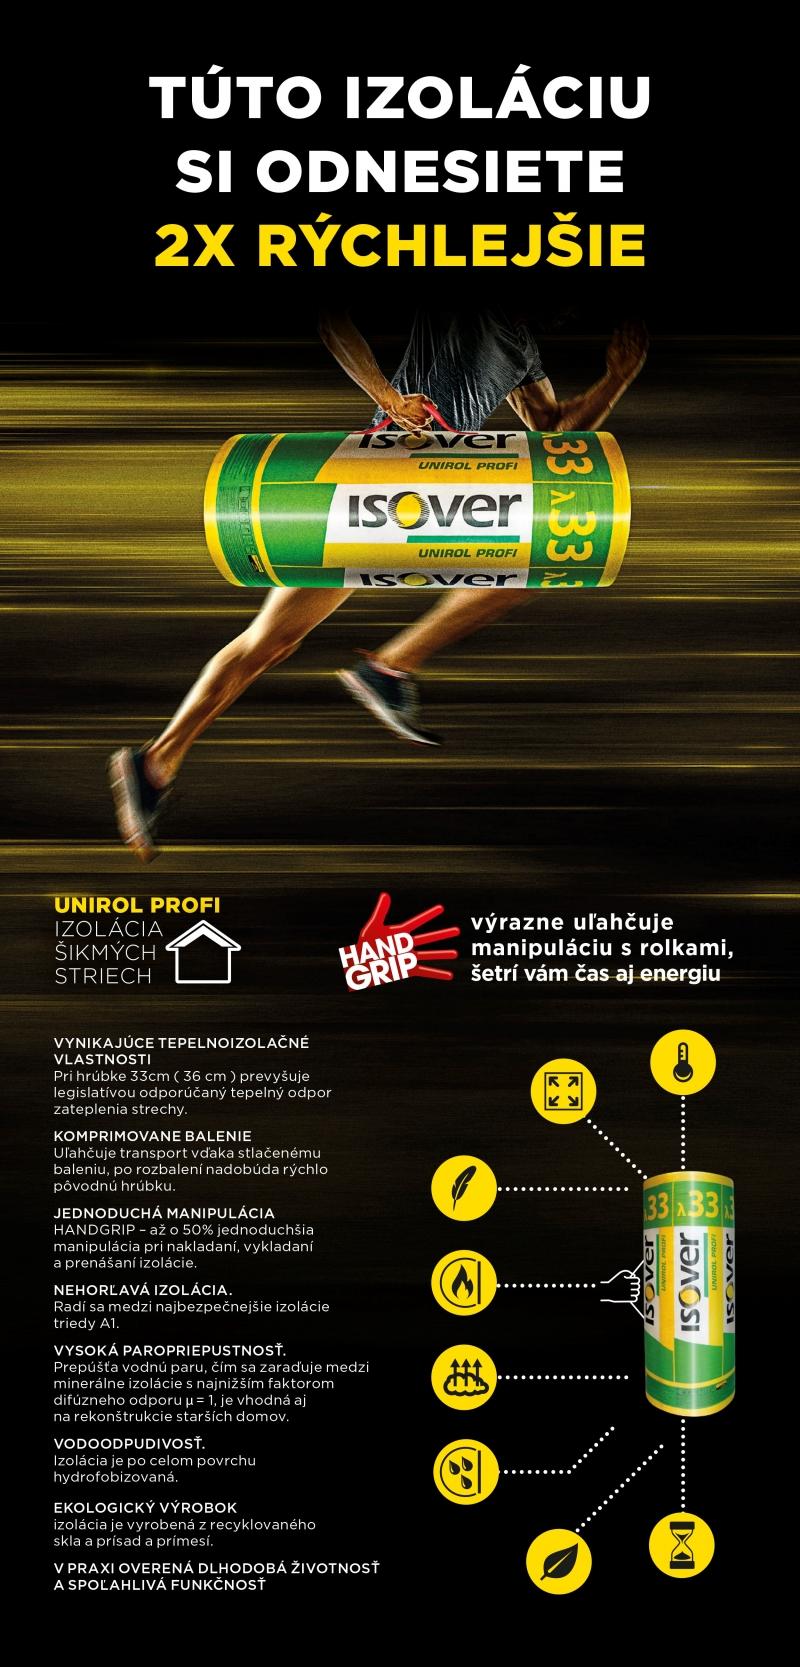 Vlastnosti izolacie ISOVER Unirol Plus a Unirol Profi s Handgripom